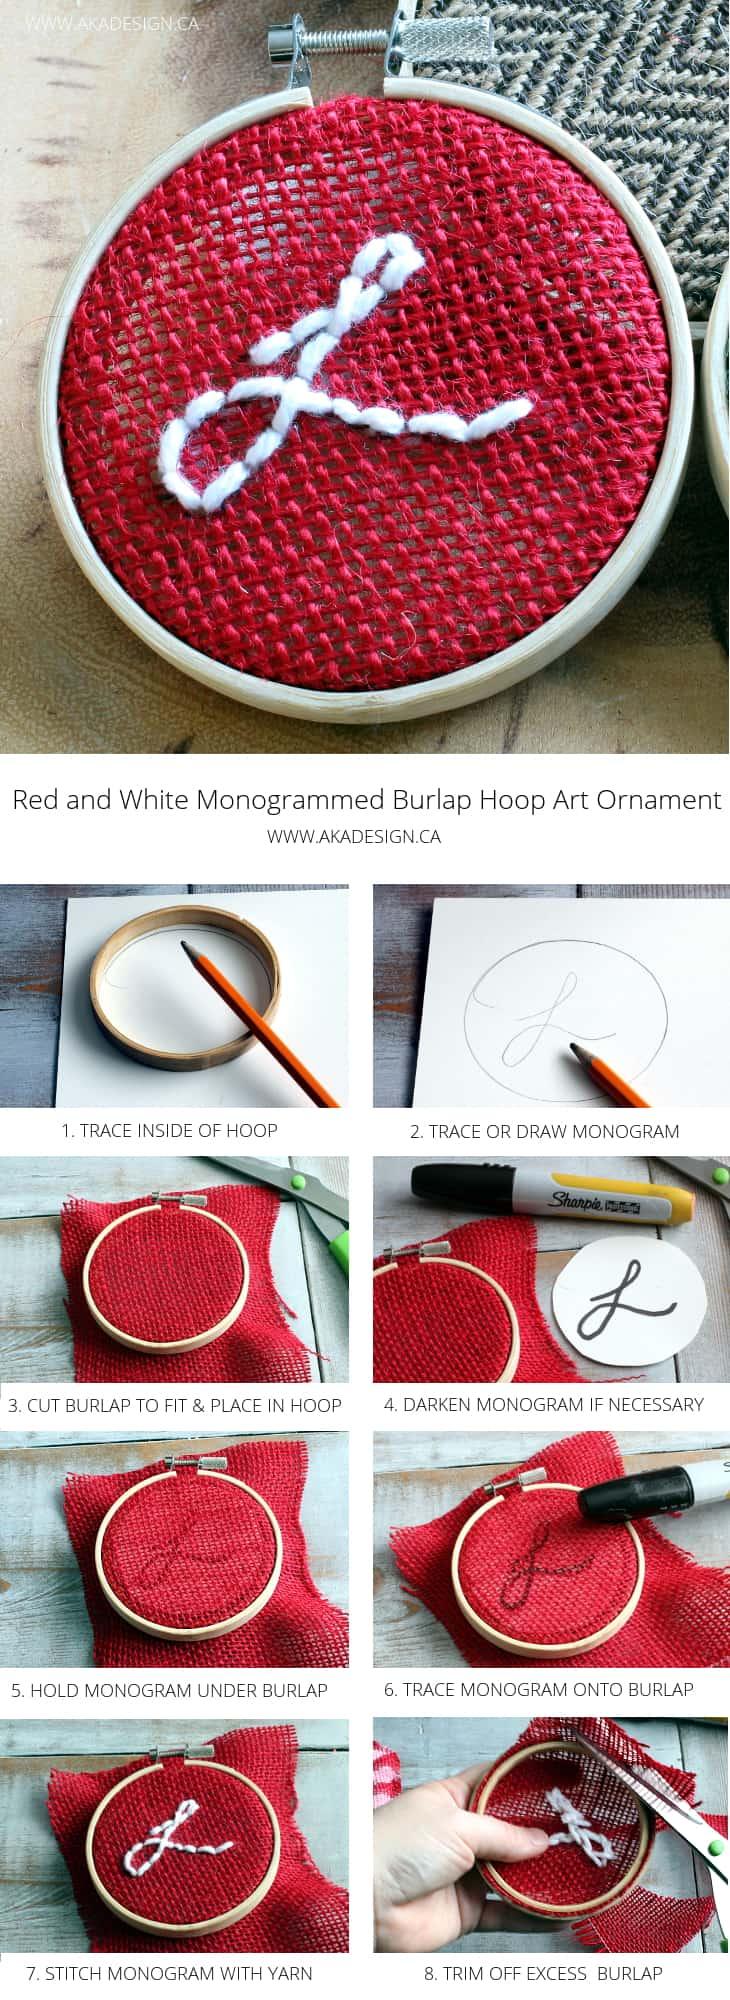 burlap monogrammed hoop art ornament